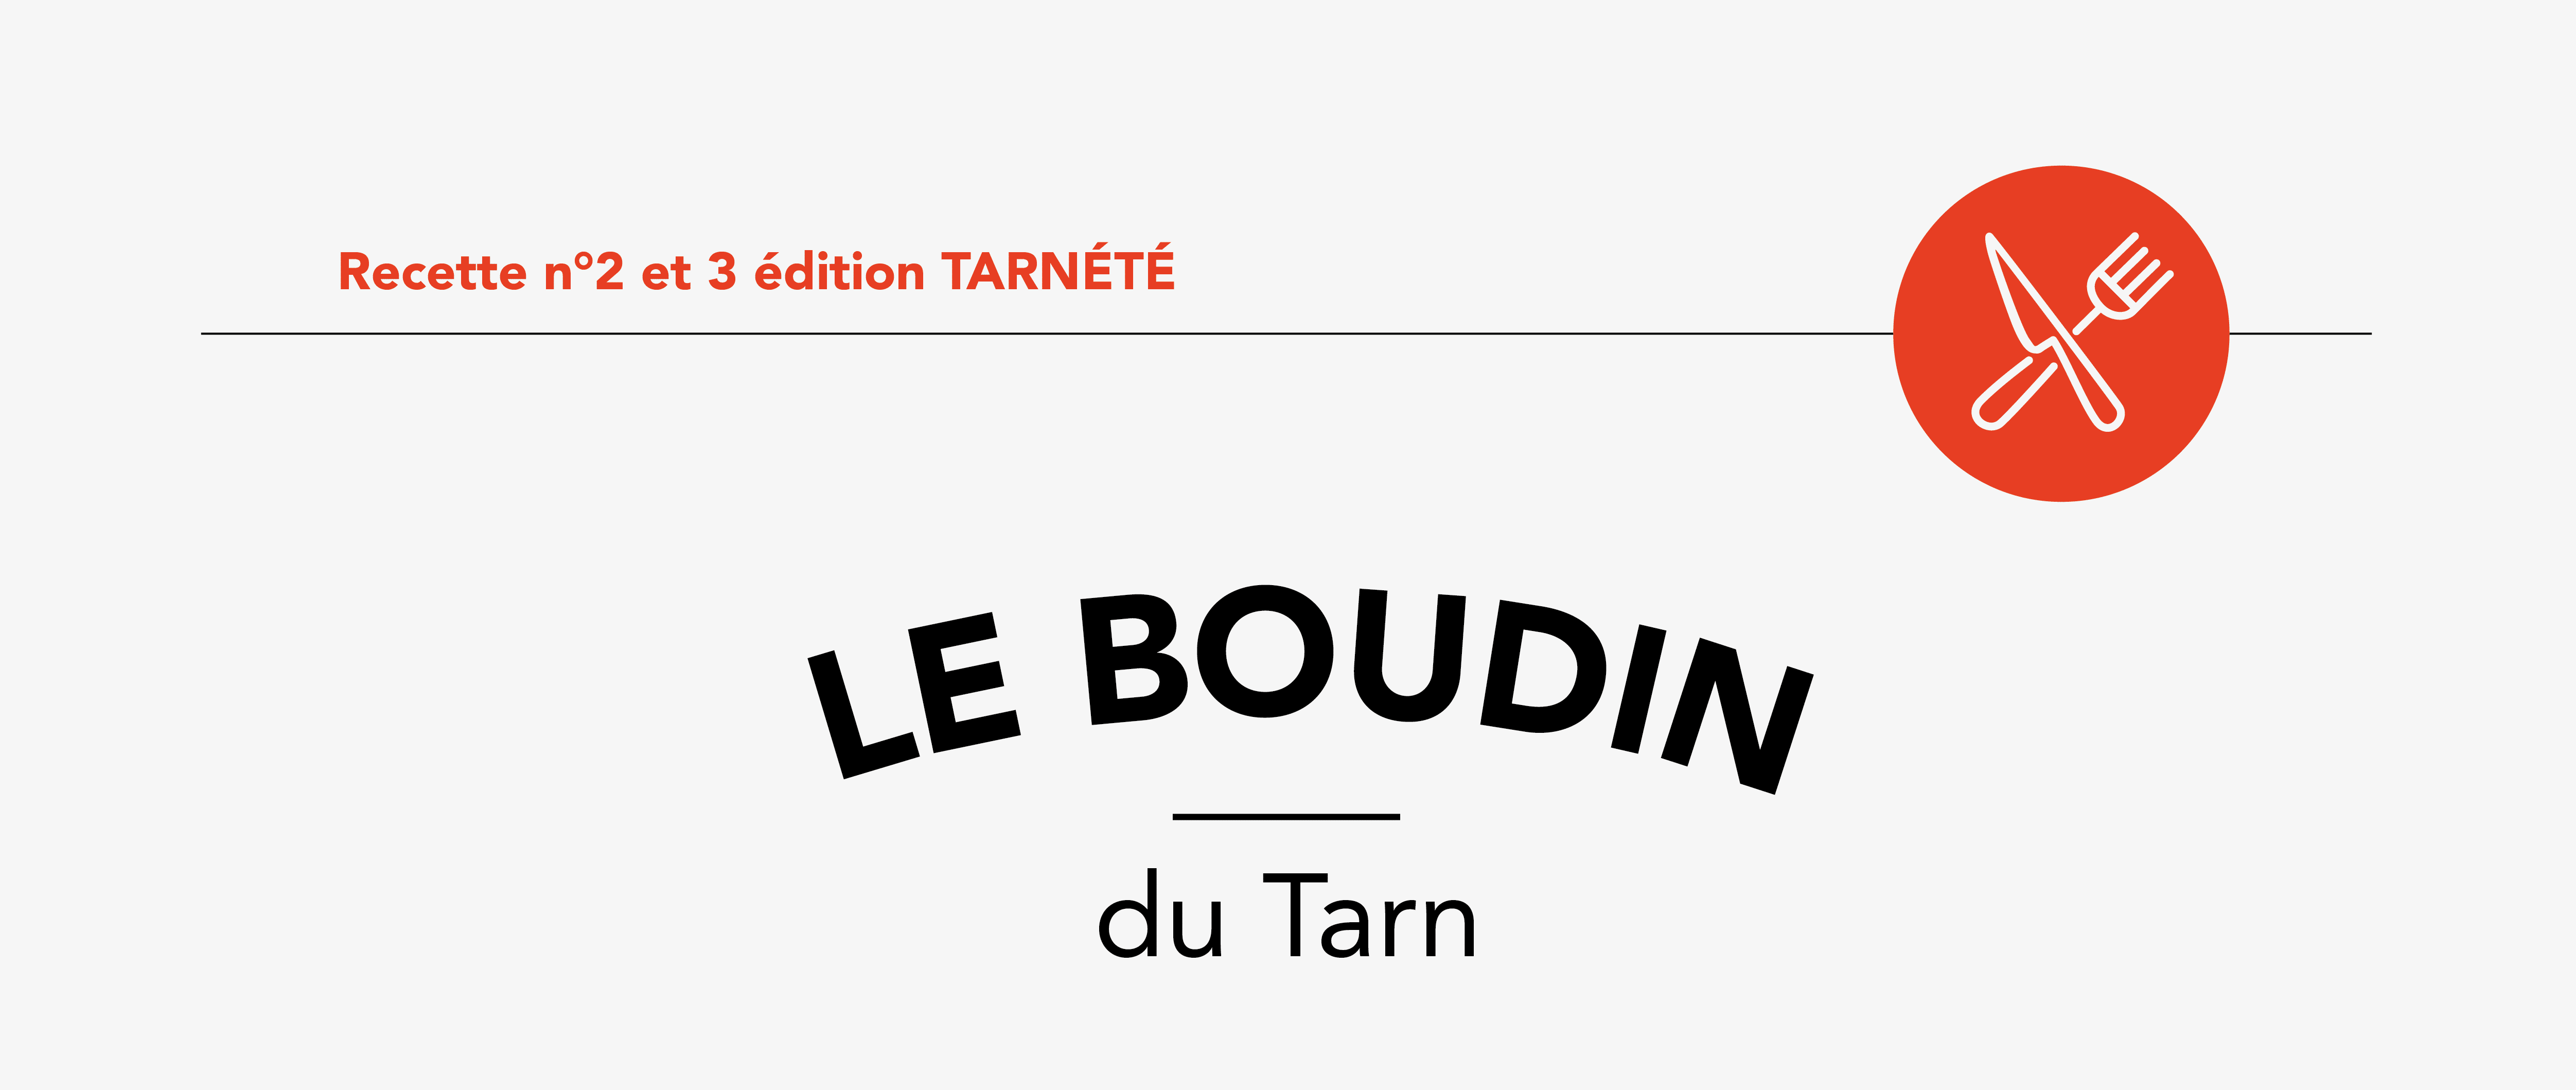 Recette-2-Boudin du Tarn-TARNETE